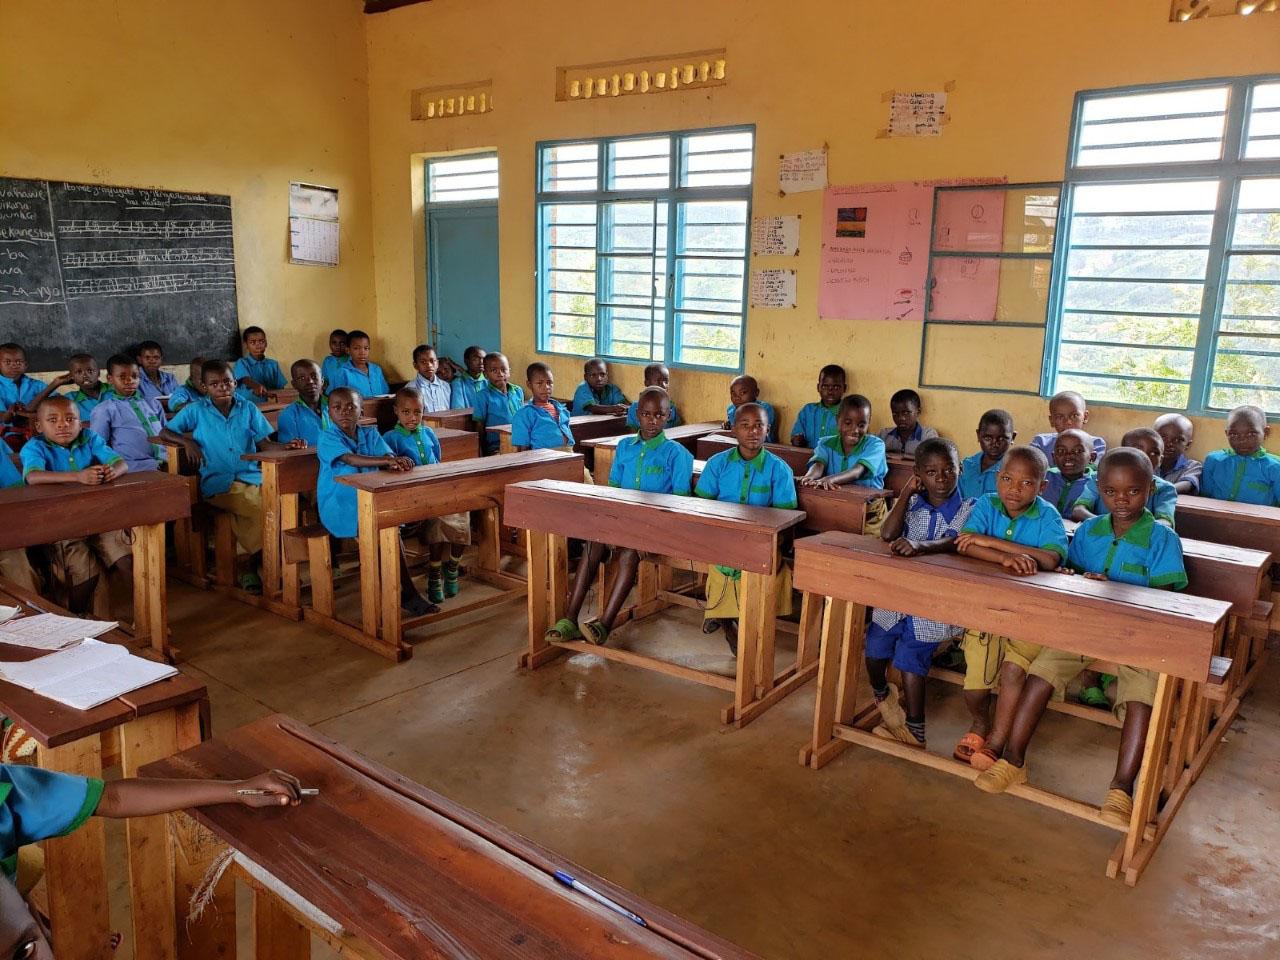 Classroom of some of the children in primary grade 1 at Kinihira Sub-parish in the Kinihira Parish in the District of Rulindo.